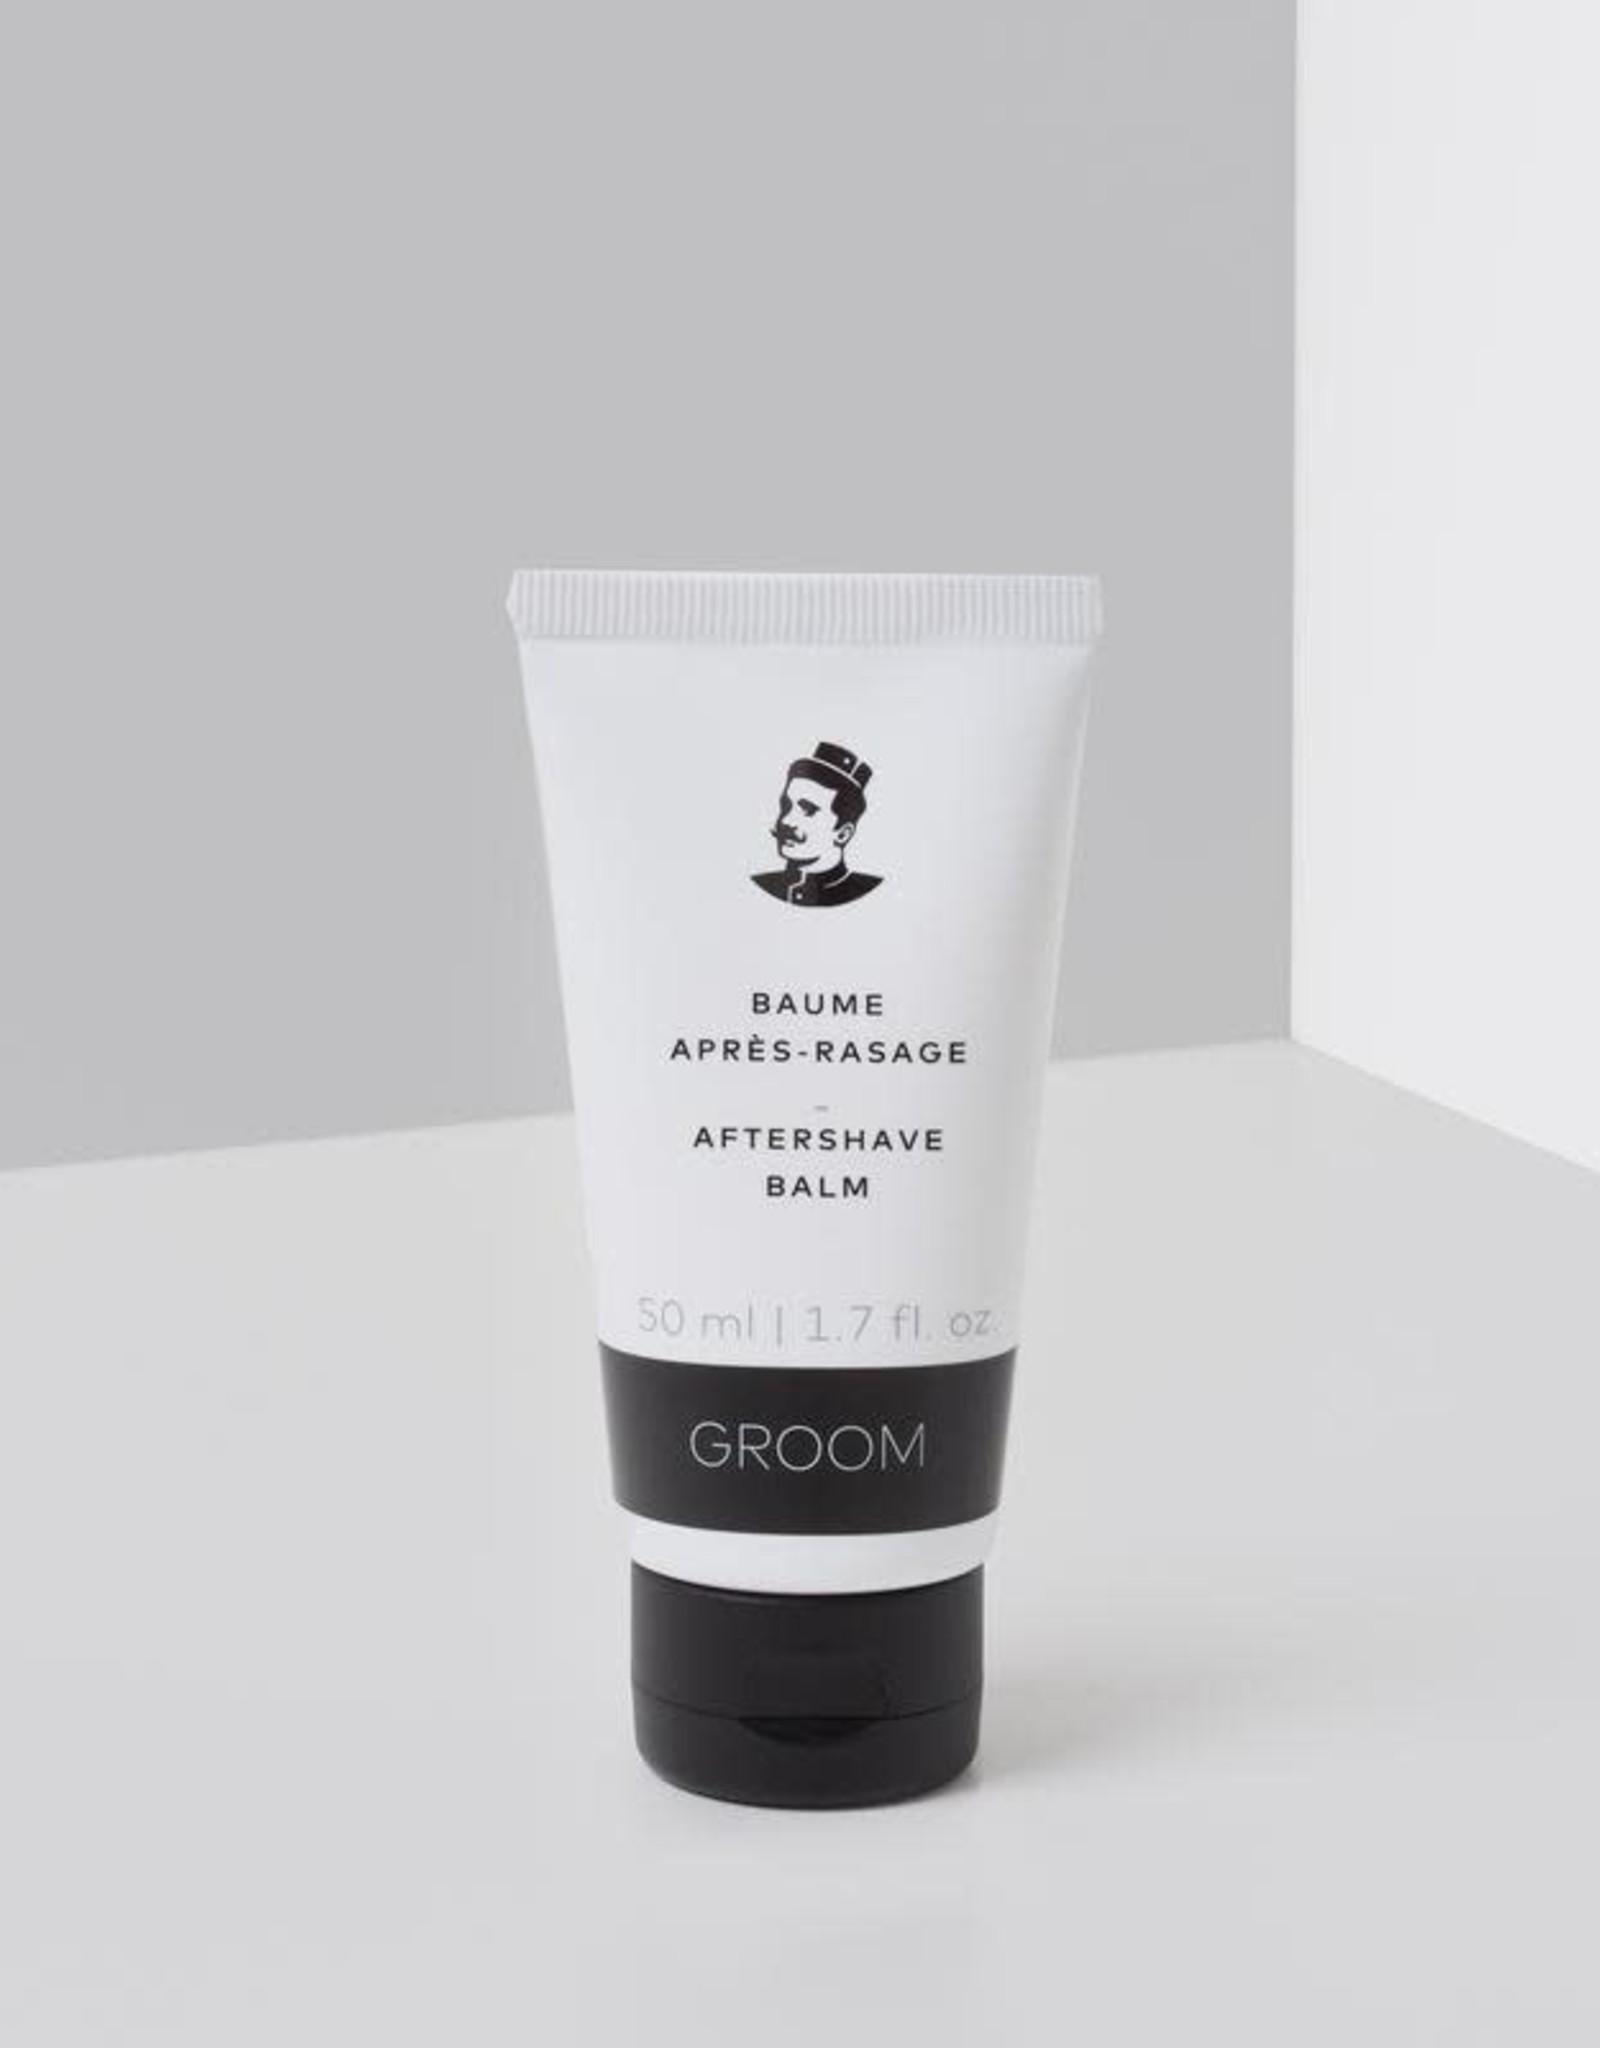 Groom Baume après-rasage